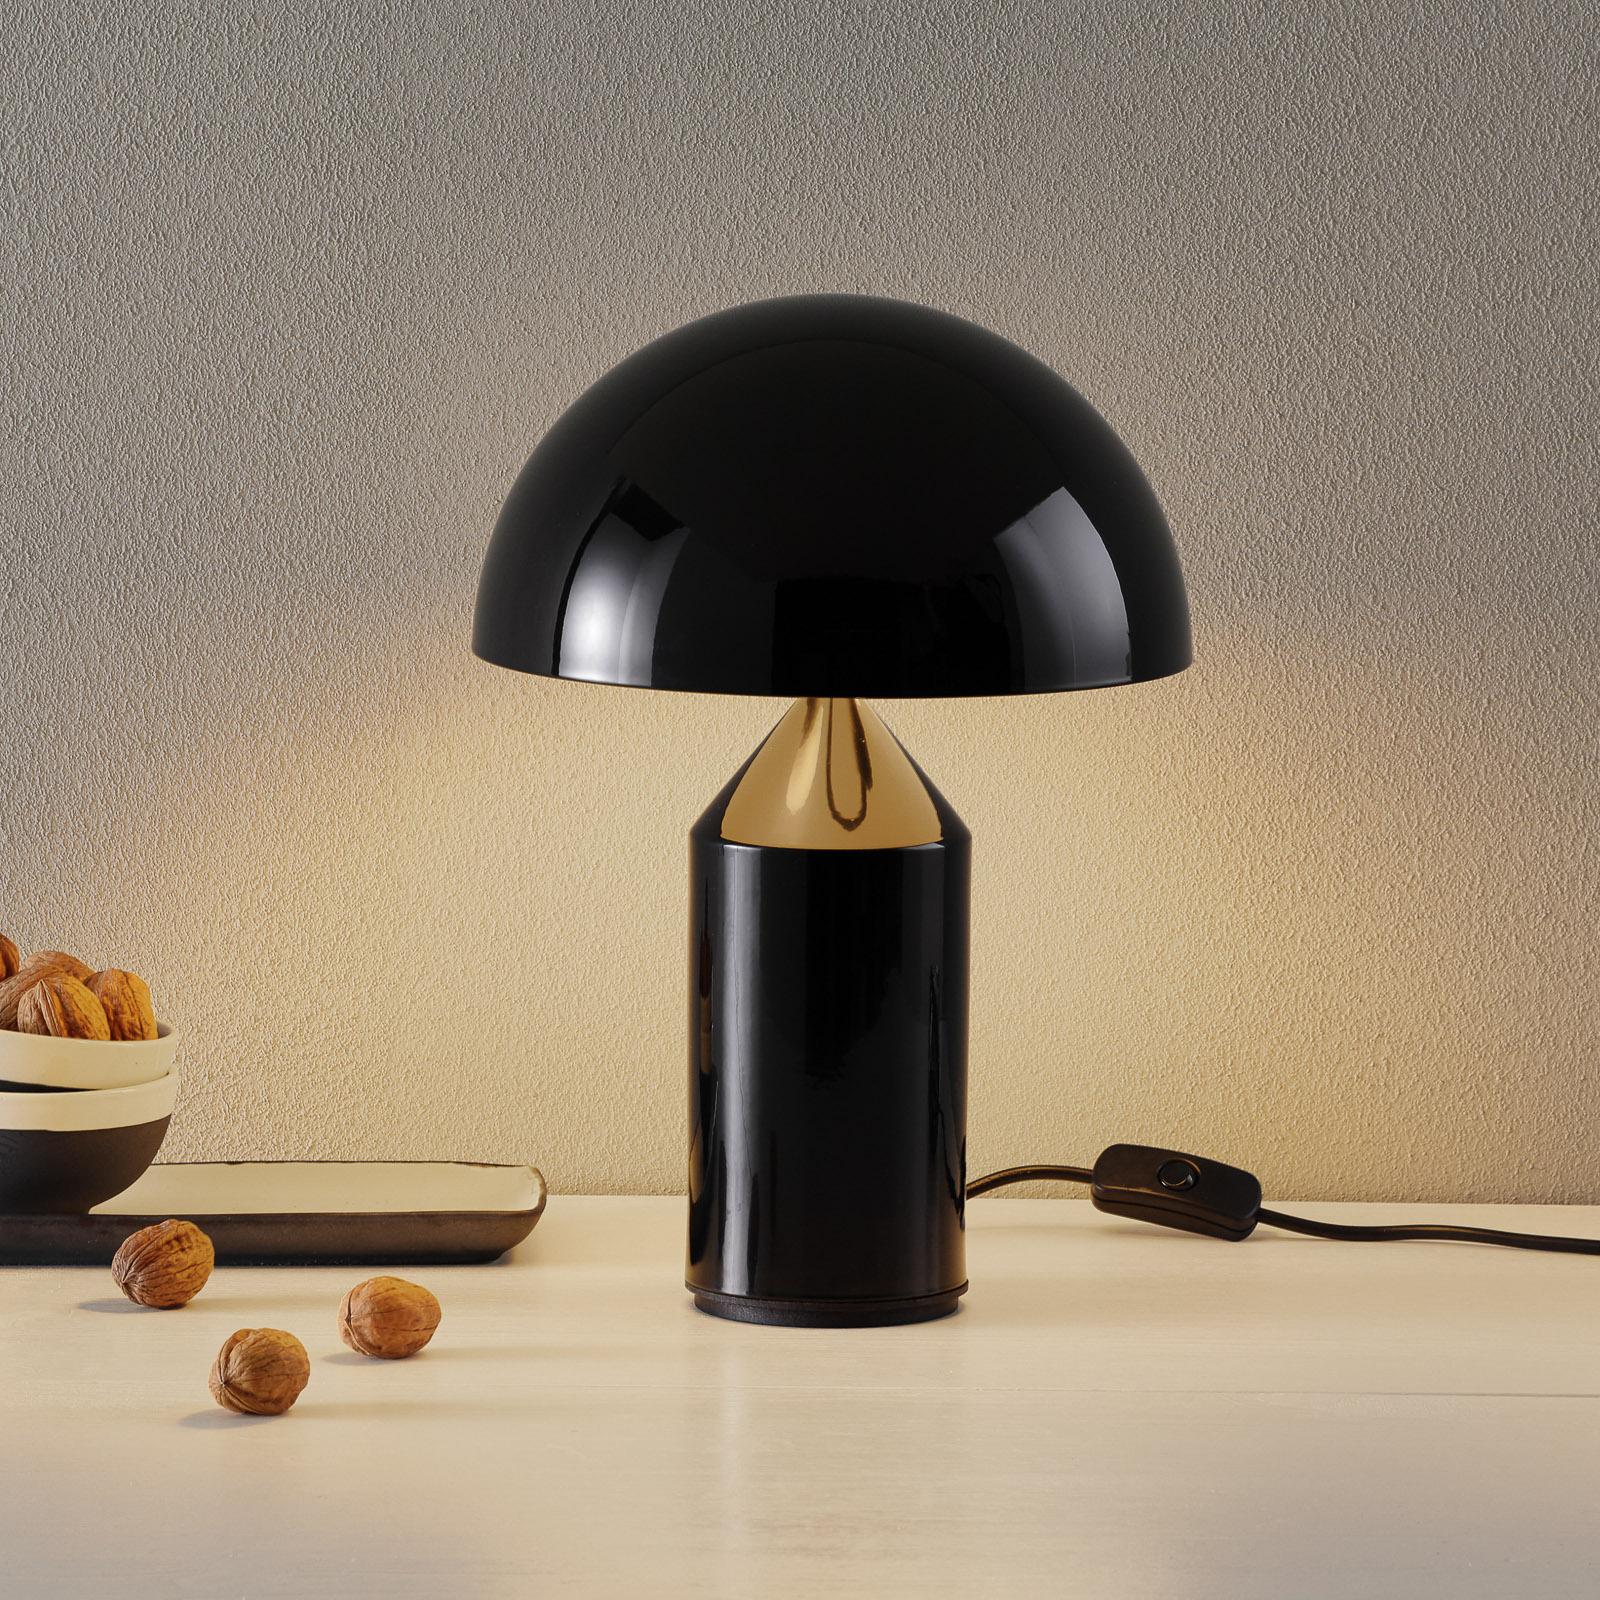 Oluce Atollo - bordlampe i svart, 35 cm